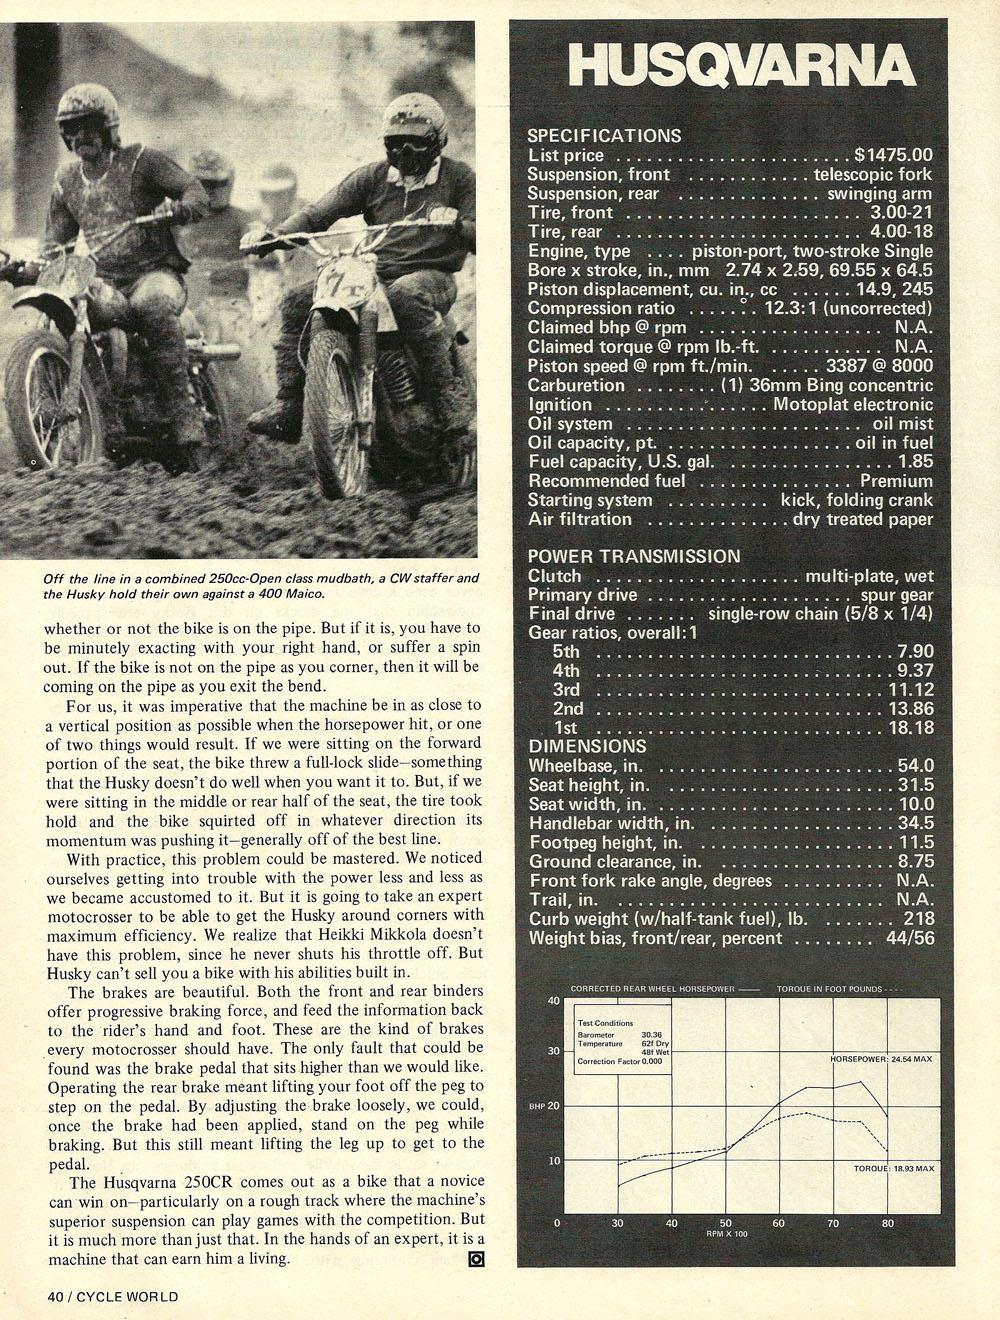 1974 Husqvarna 250 CR road test 05.jpg